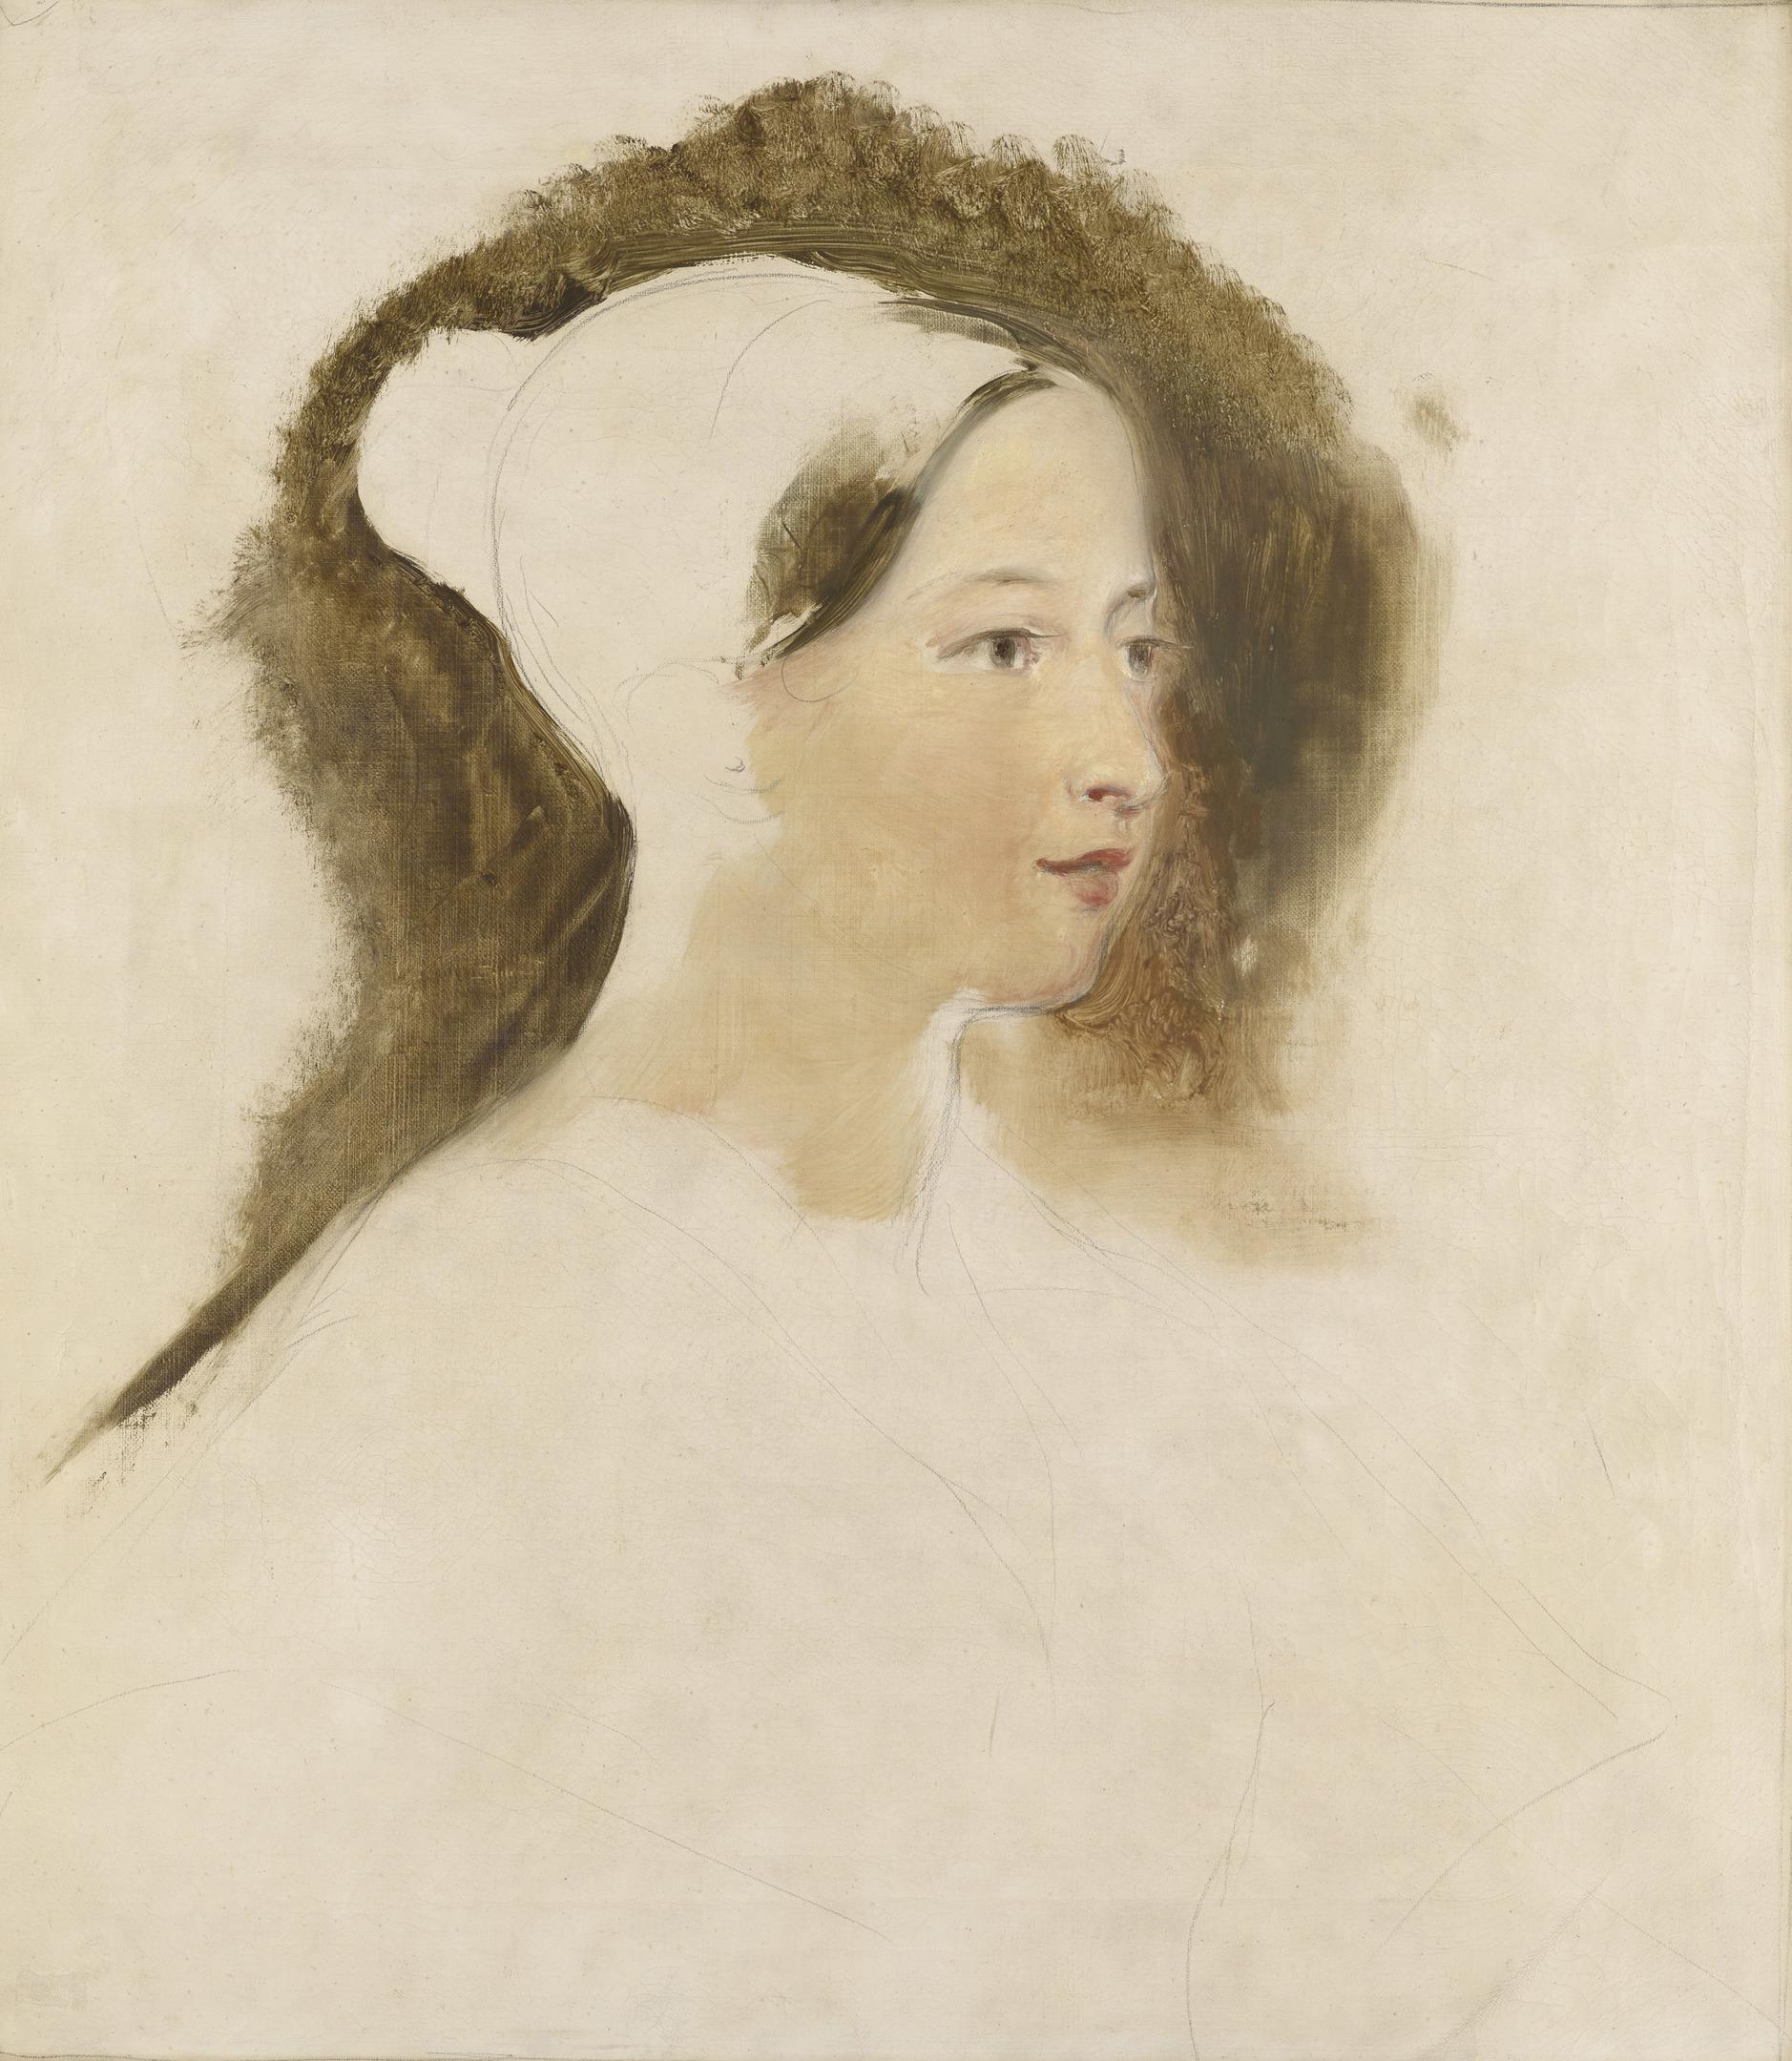 Sir David Wilkie's preparatory oil sketch of Queen Victoria, 1837